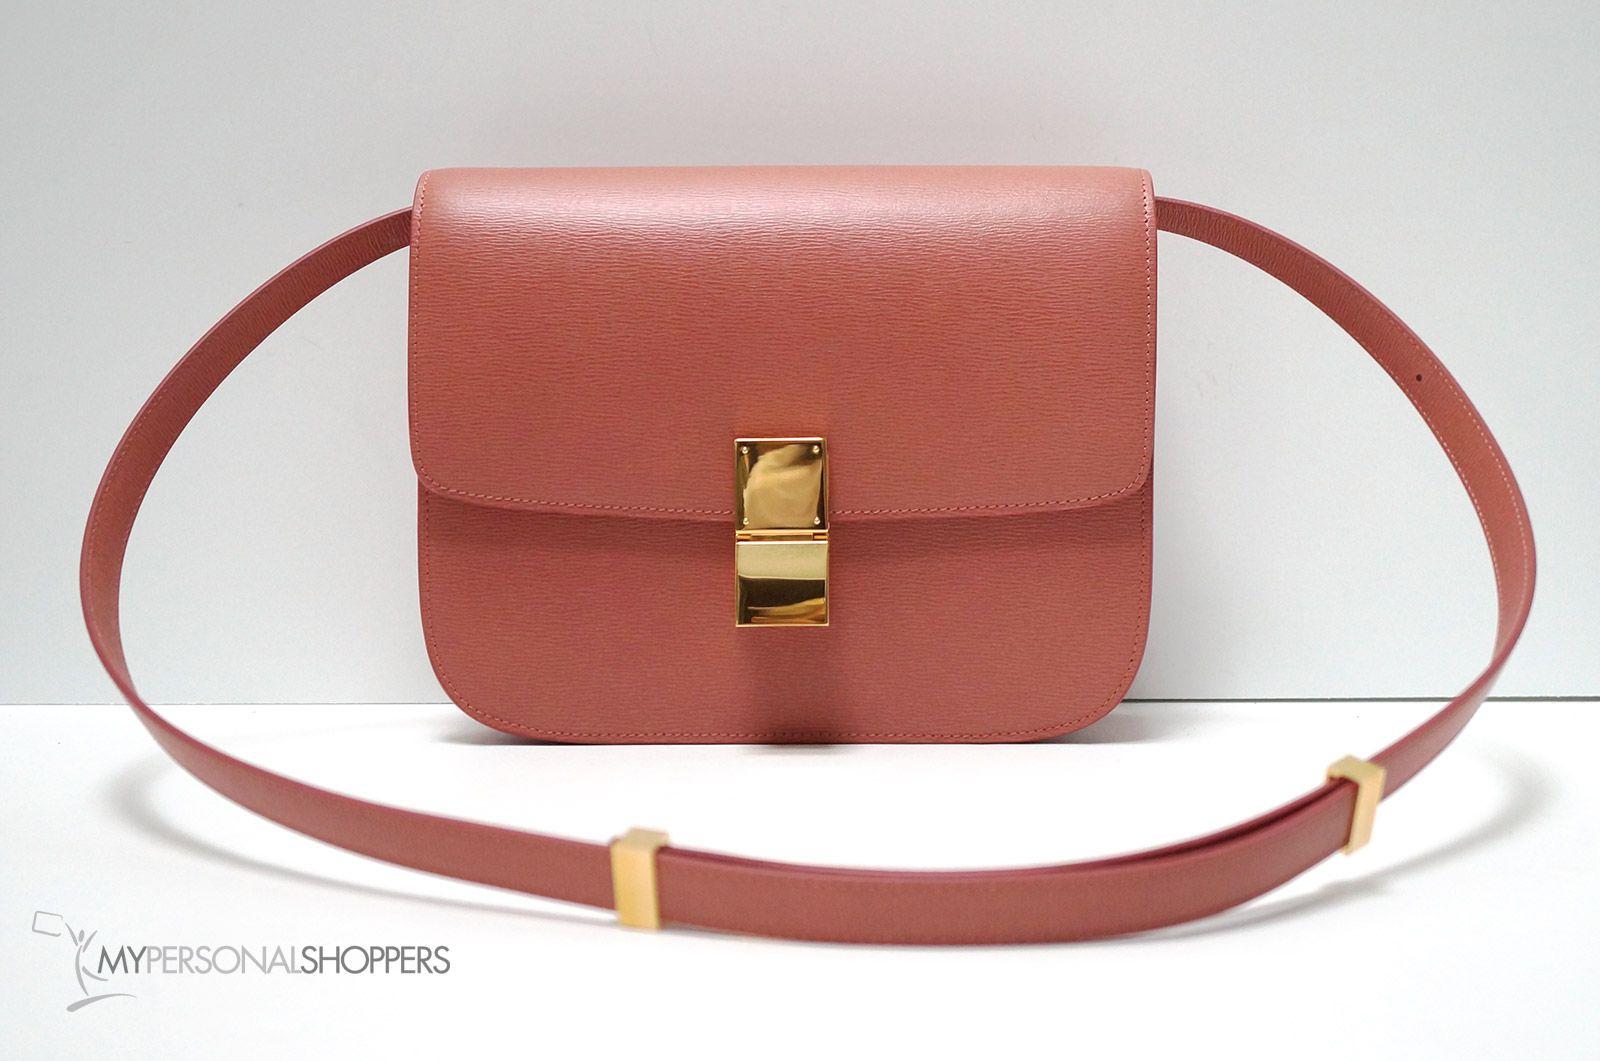 Celine Classic Terracotta Medium Textured Leather Box Bag, New